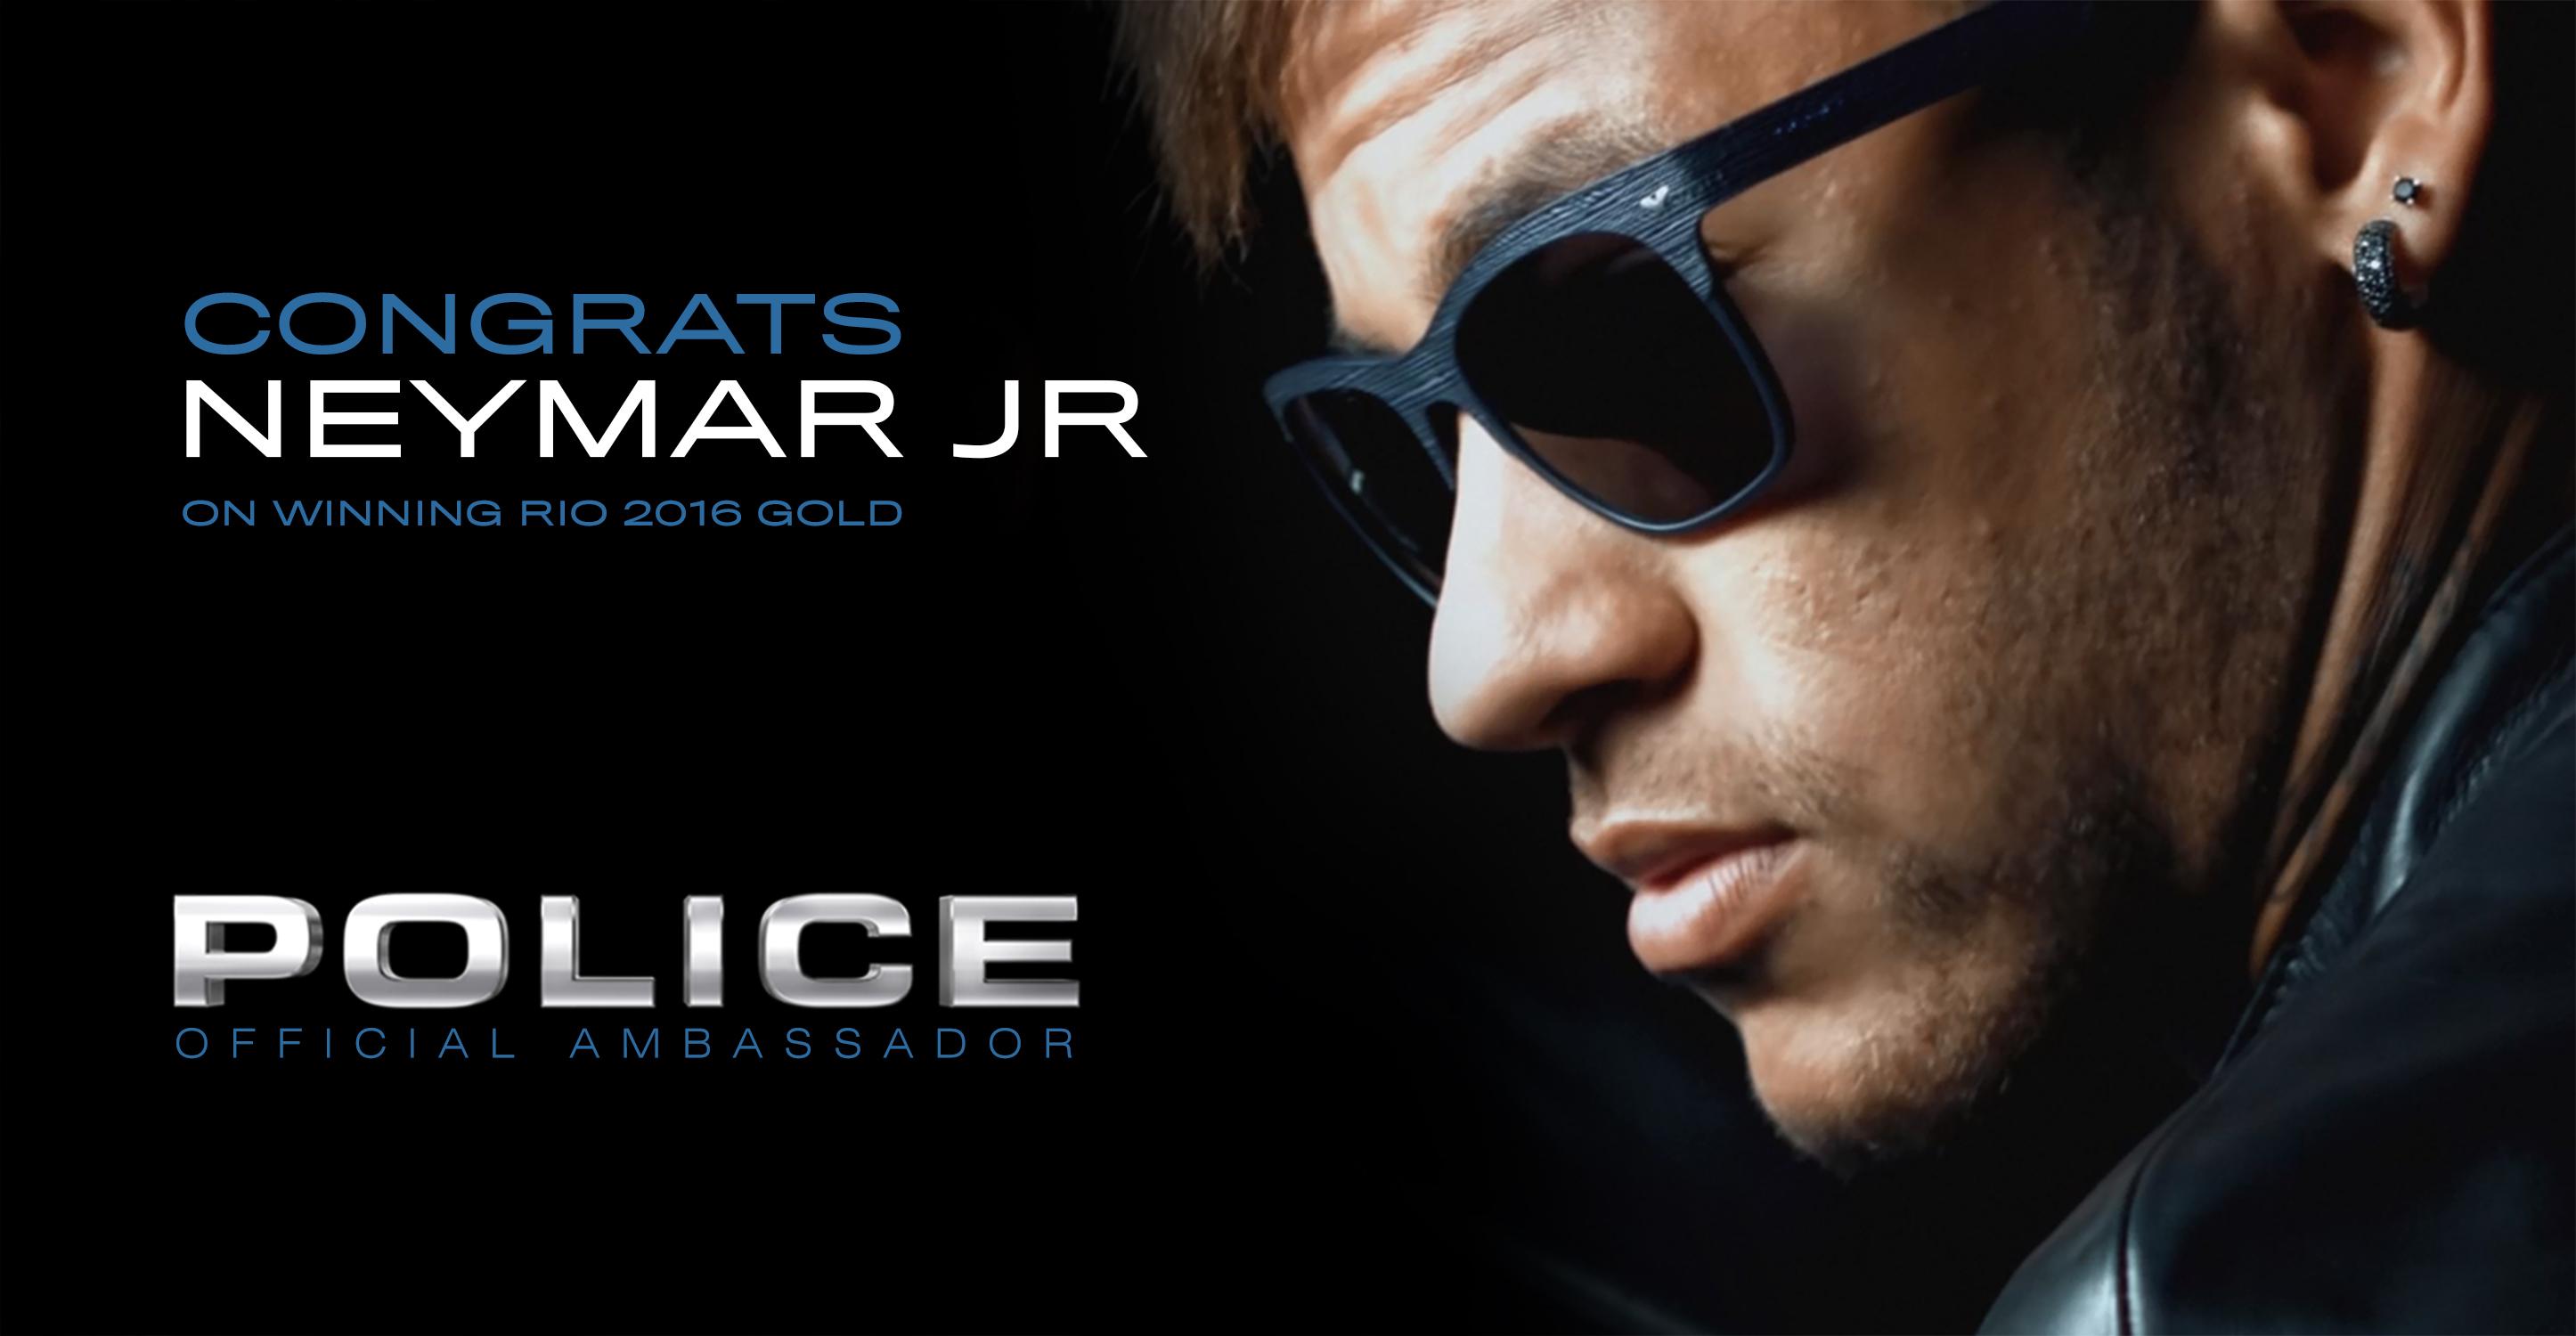 Congrats Neymar JR